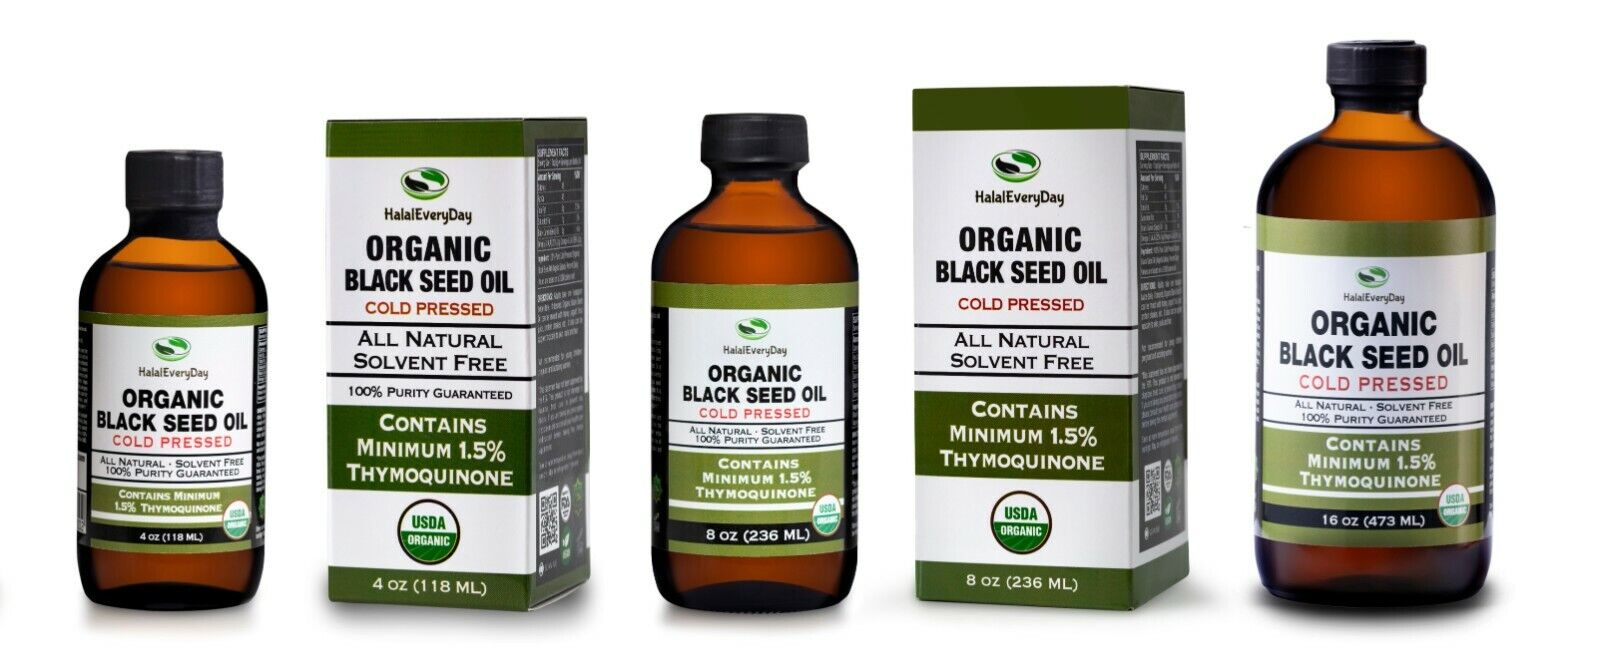 Black Seed Oil - USDA Organic 100% Pure COLD PRESSED Cumin Nigella Sativa GLASS 1